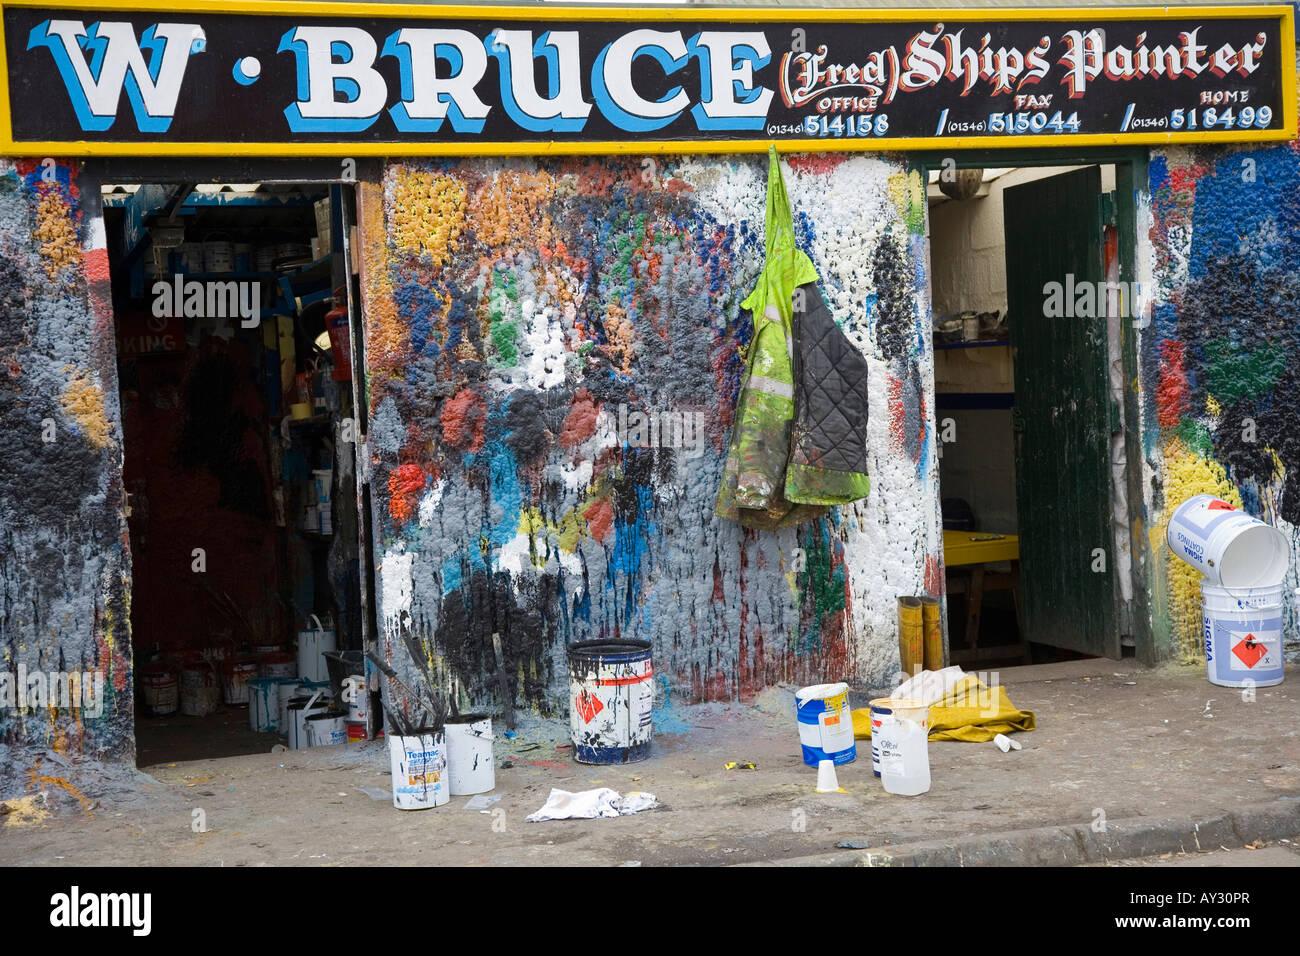 Commercial Paint Shop_ W.Bruce ship painters, Fraserburgh Scotland uk - Stock Image